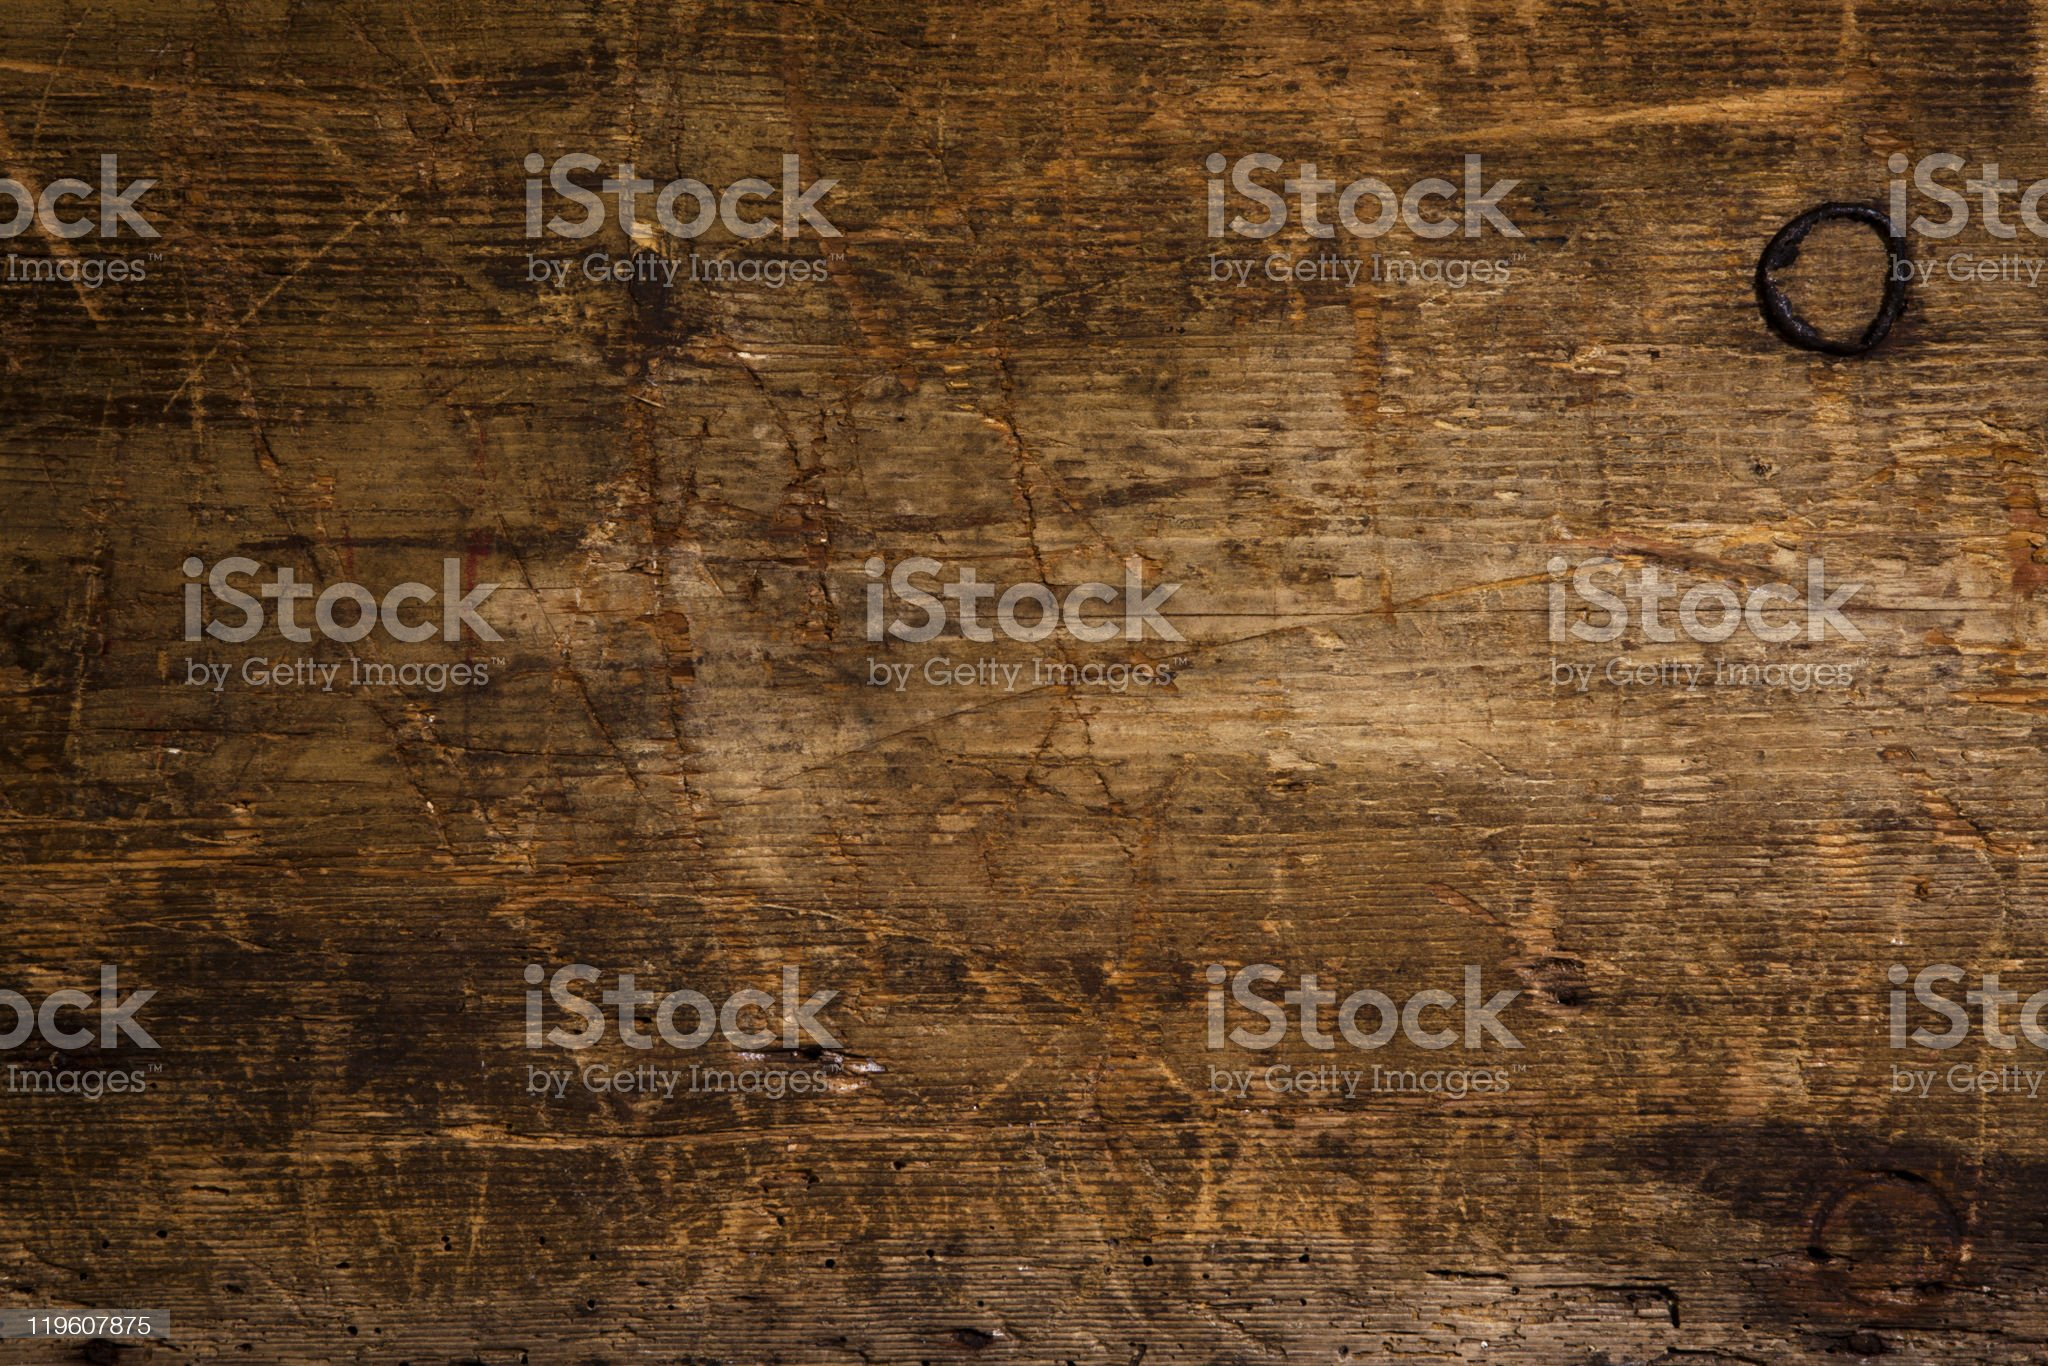 Old grunge dark textured wood background royalty-free stock photo